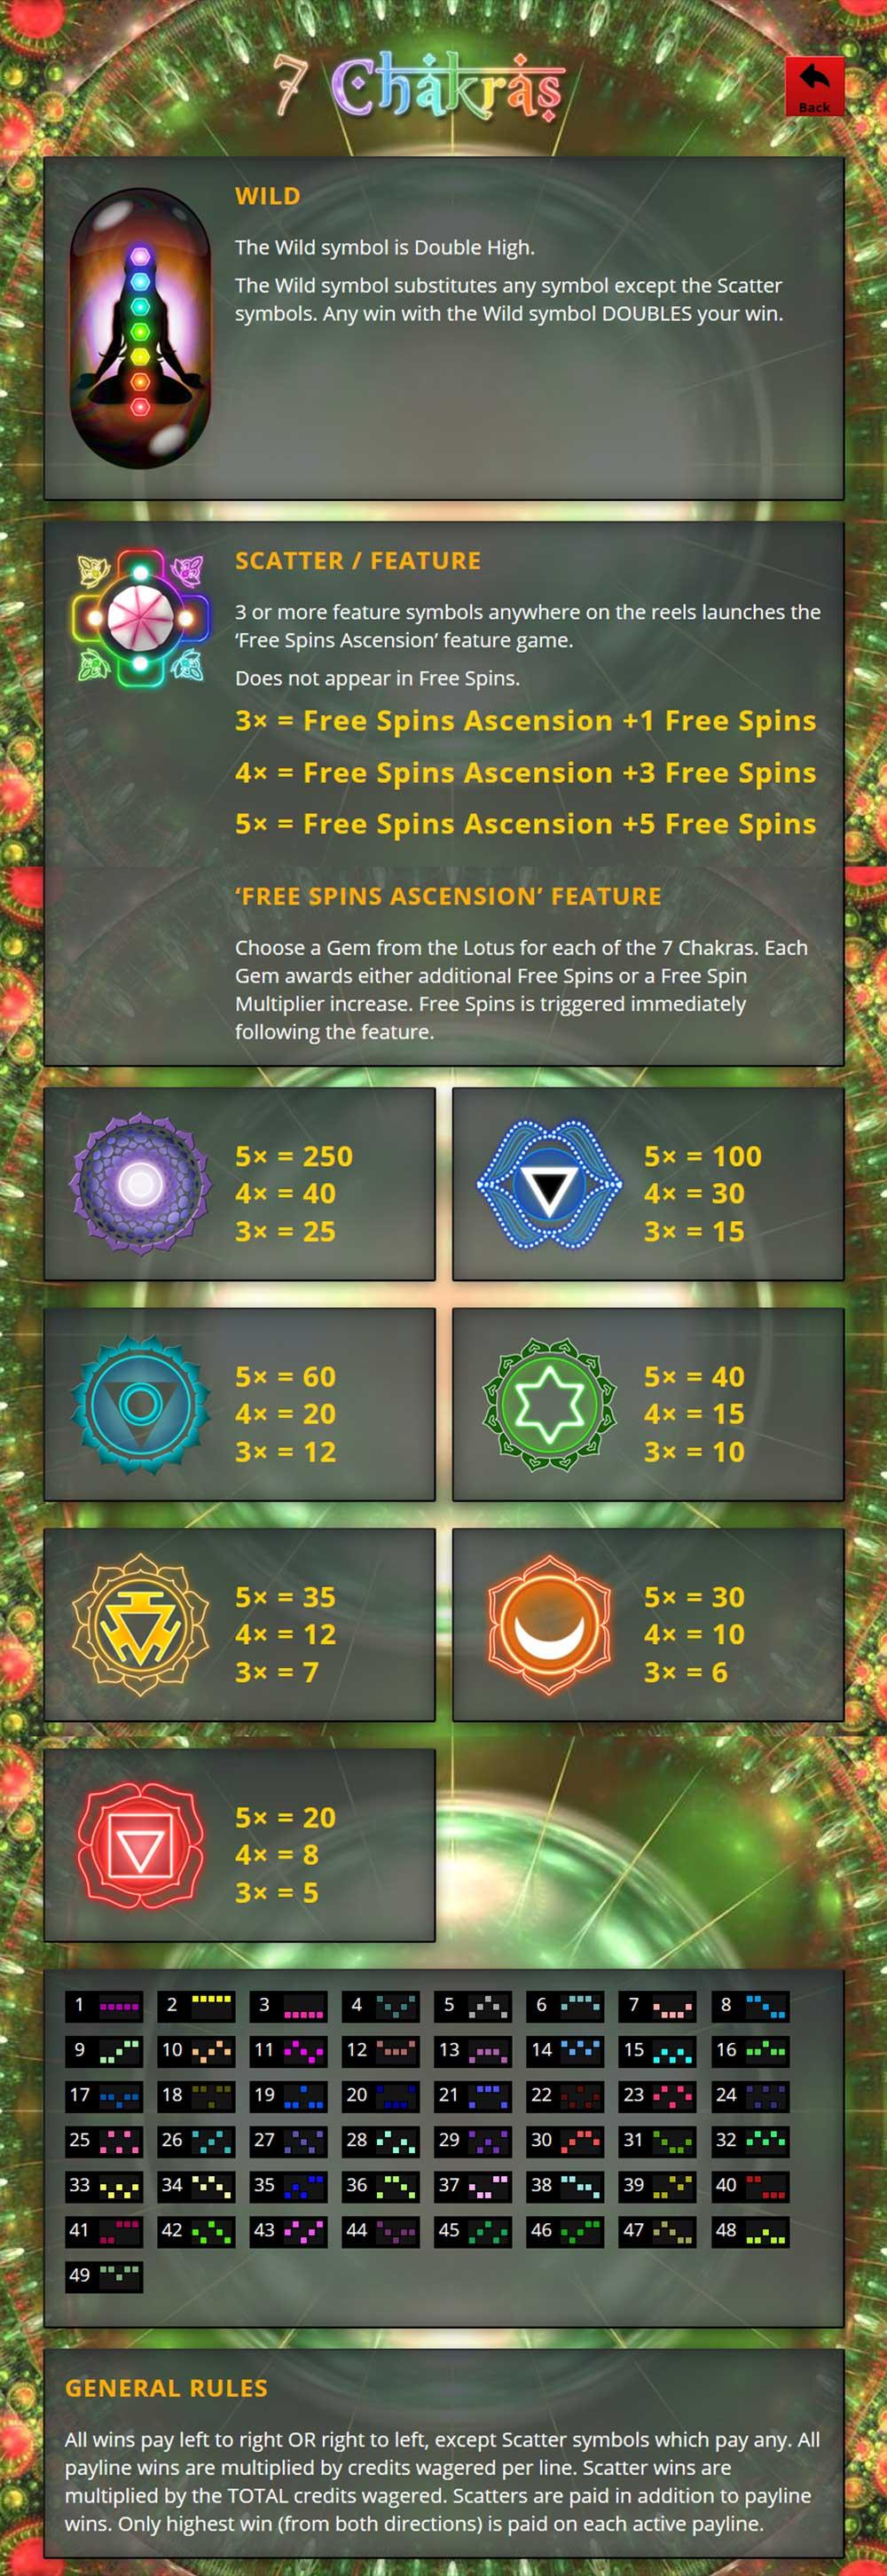 7 Chakras Pay Table Screenshot, Treasure Mile